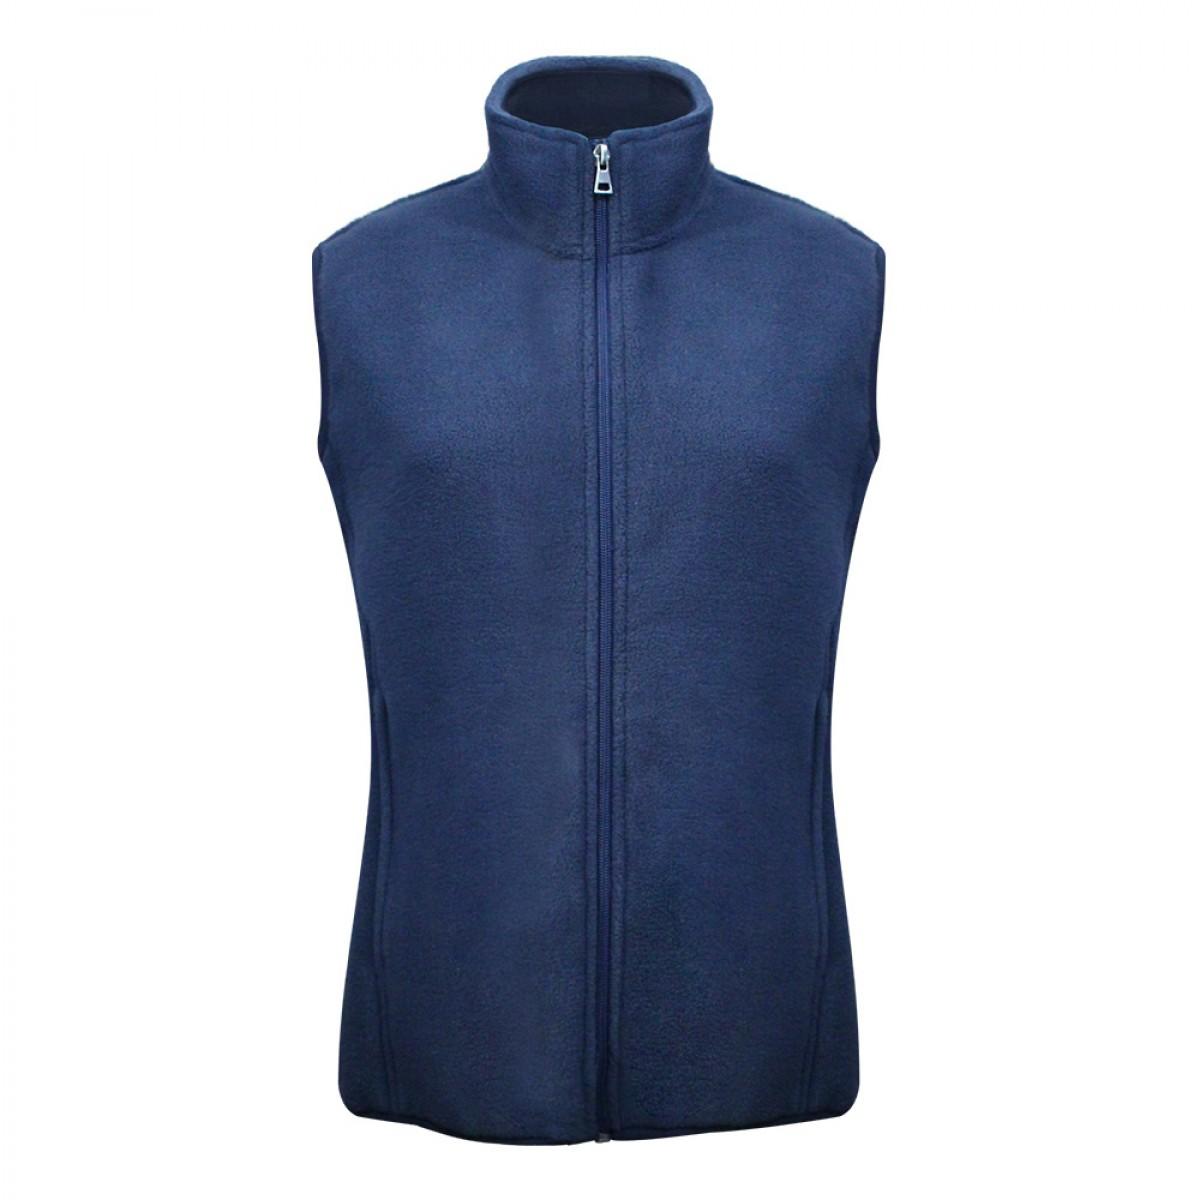 women-fleece-half-jacket-kfj96795-5a